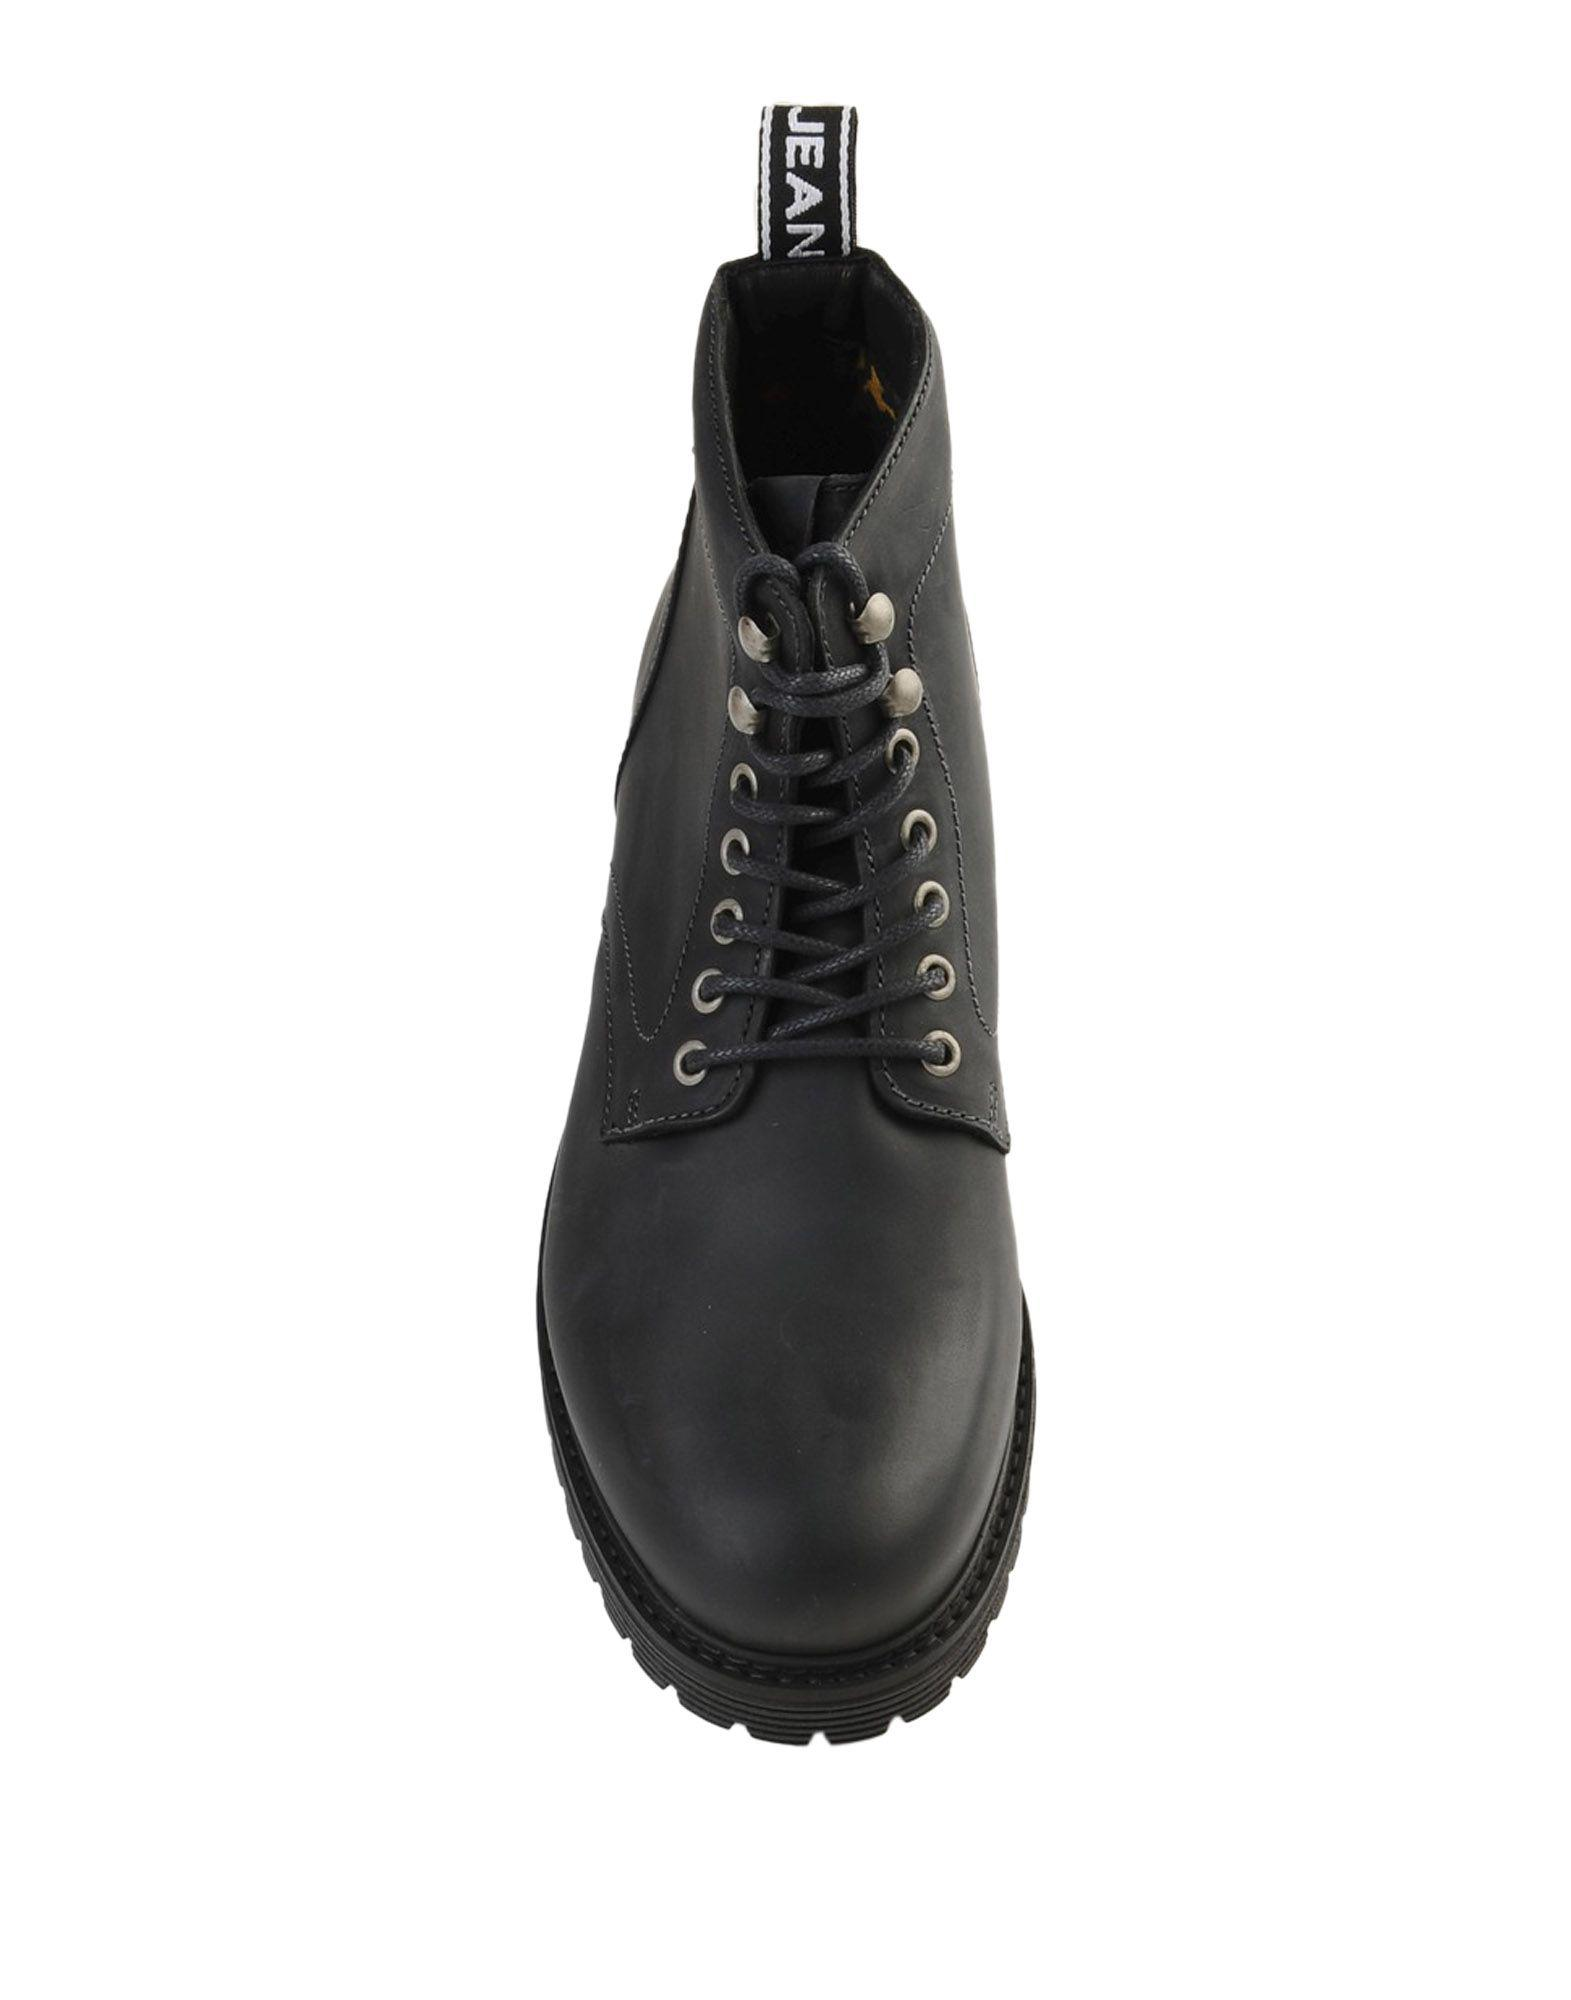 b9ec9c64001c6e Tommy Hilfiger - Black Ankle Boots for Men - Lyst. View fullscreen